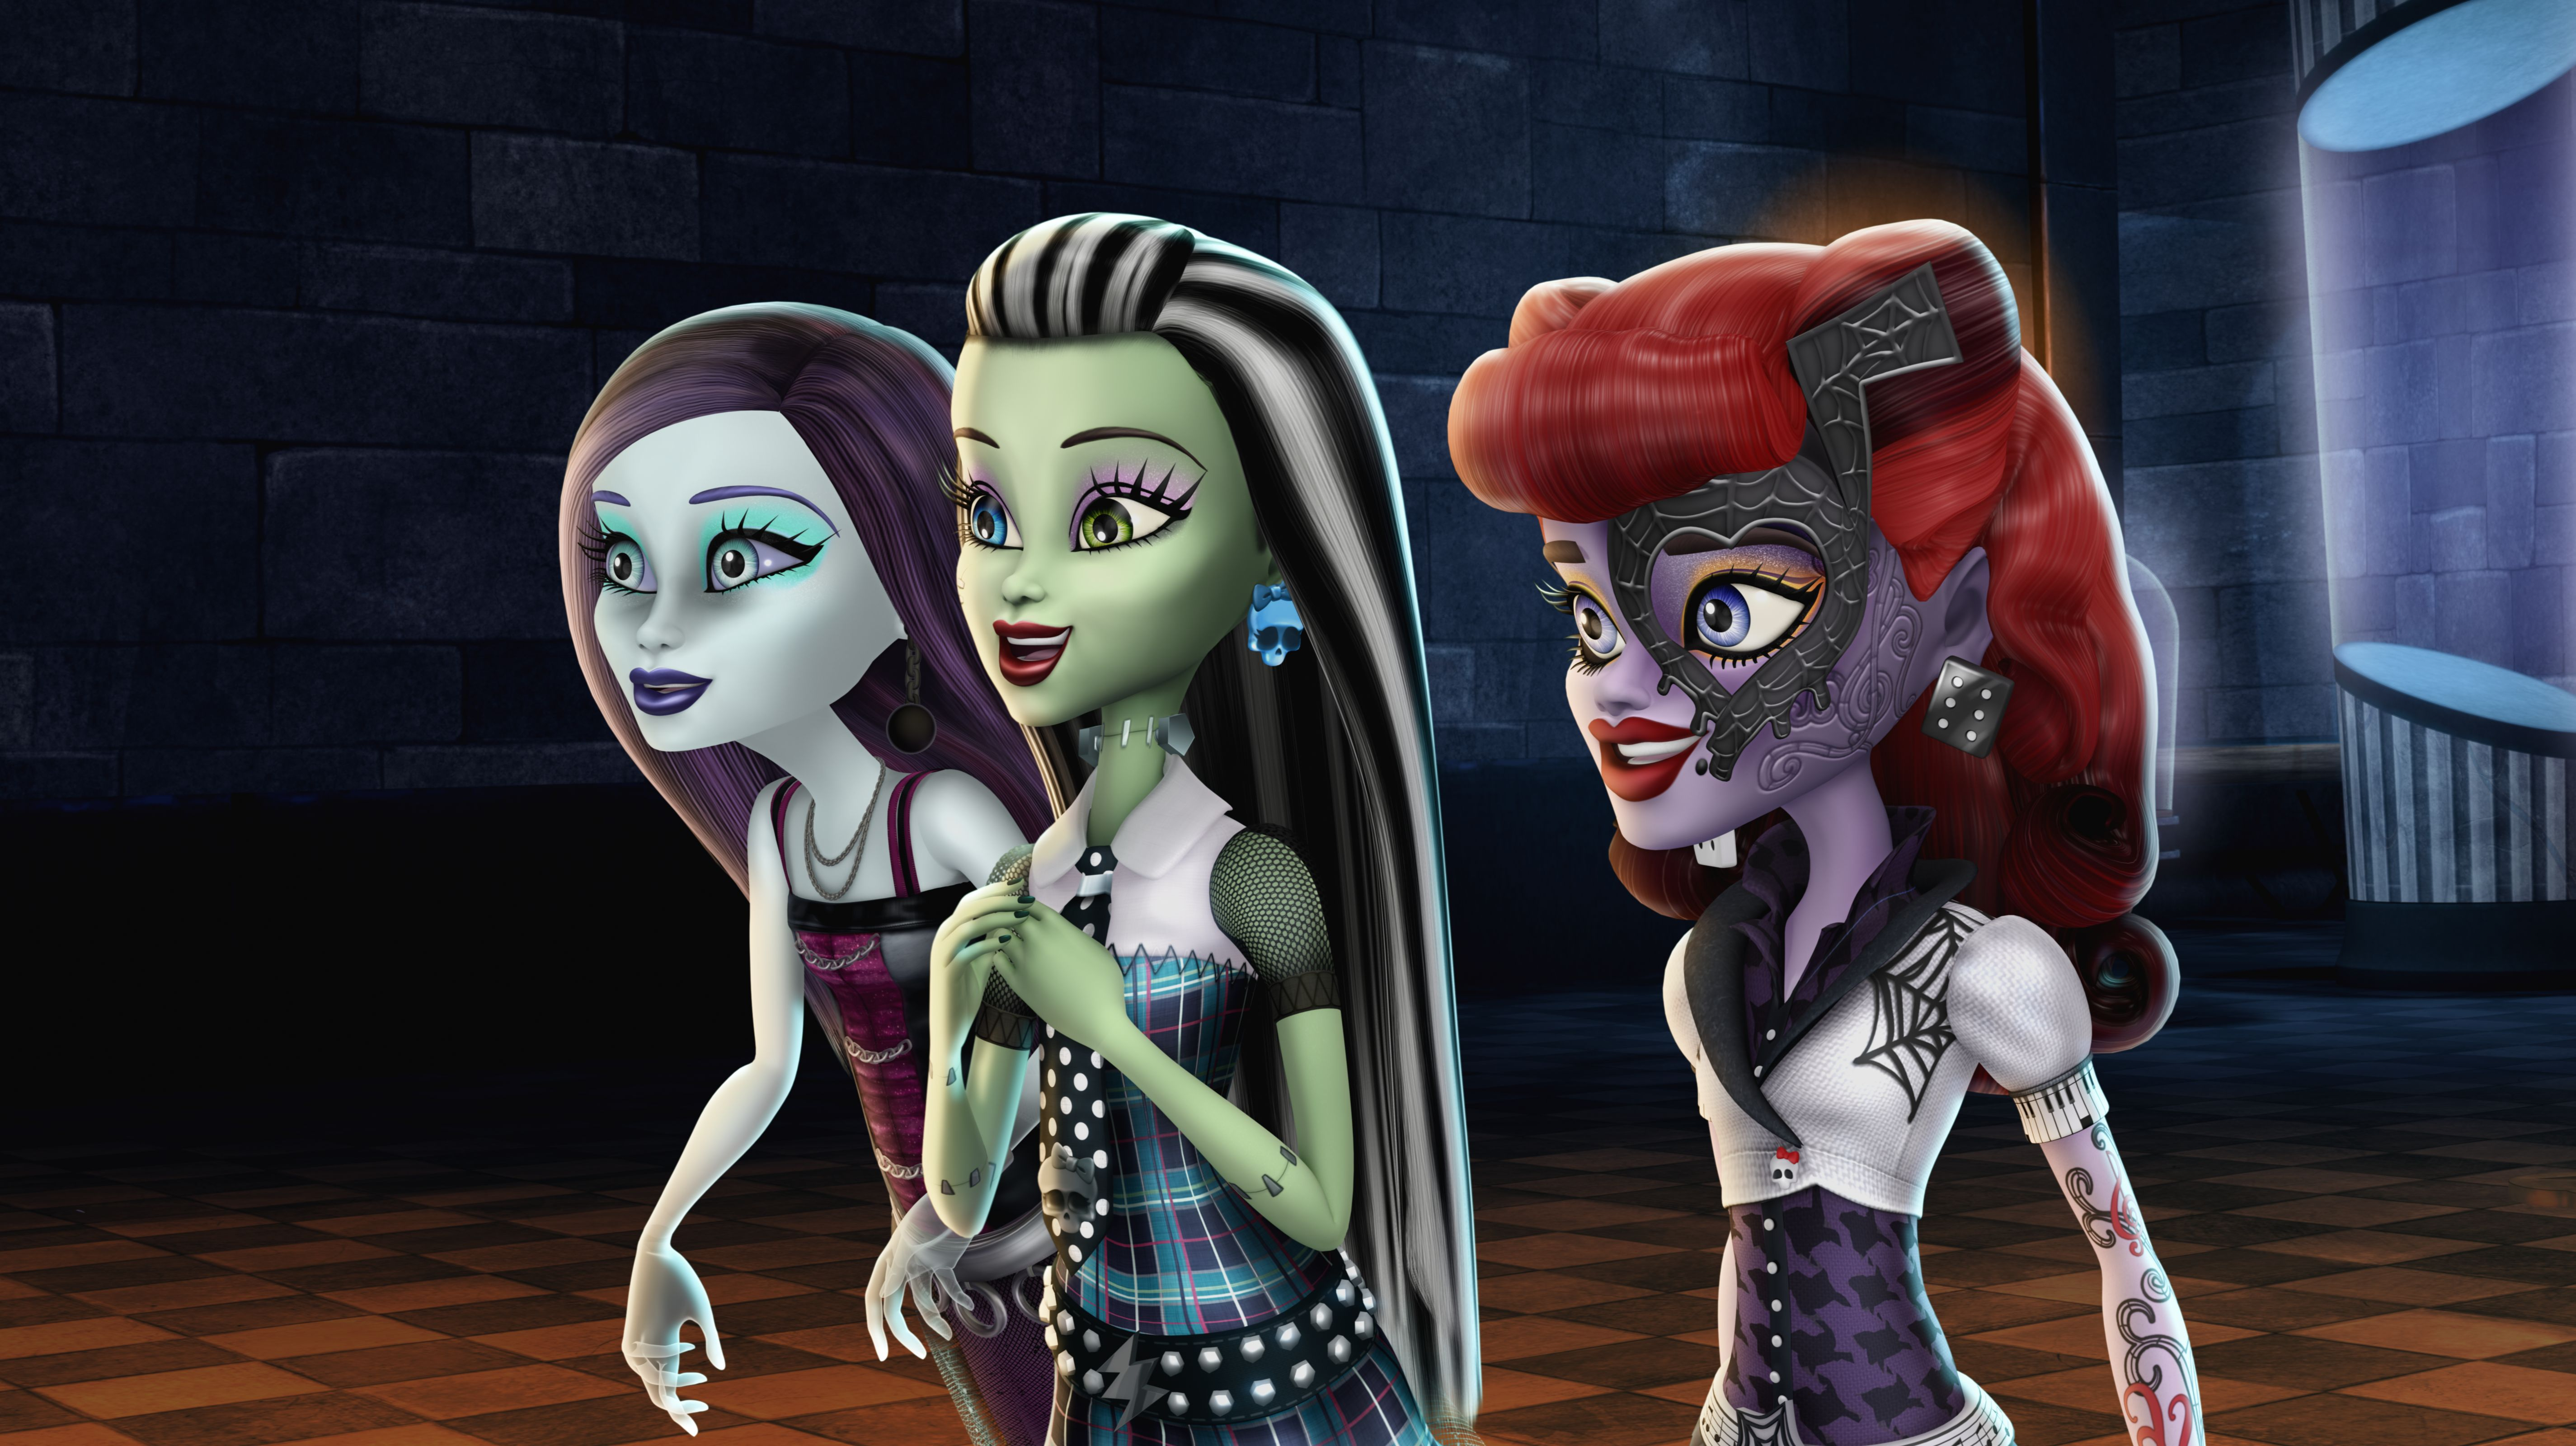 Fondos De Pantalla De Monster High: Monster High: Ghouls Rule 5k Retina Ultra Fondo De